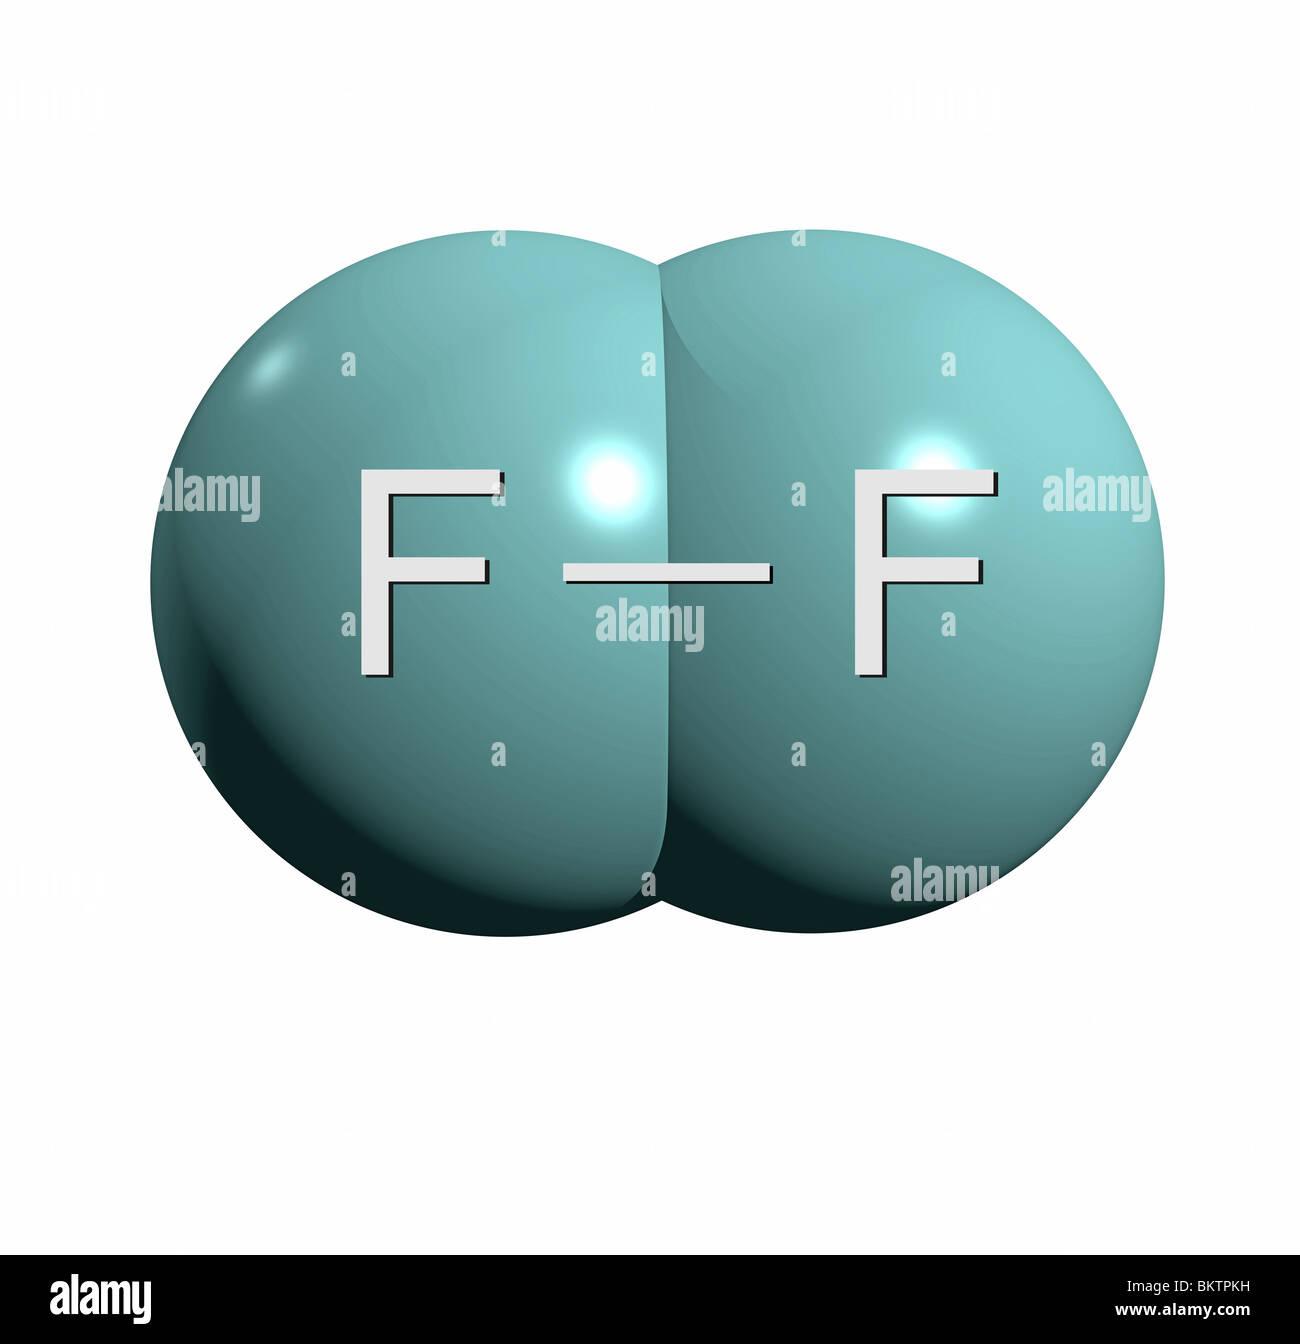 Fluormolekül F2 / fluorine molecule F2 Stock Photo